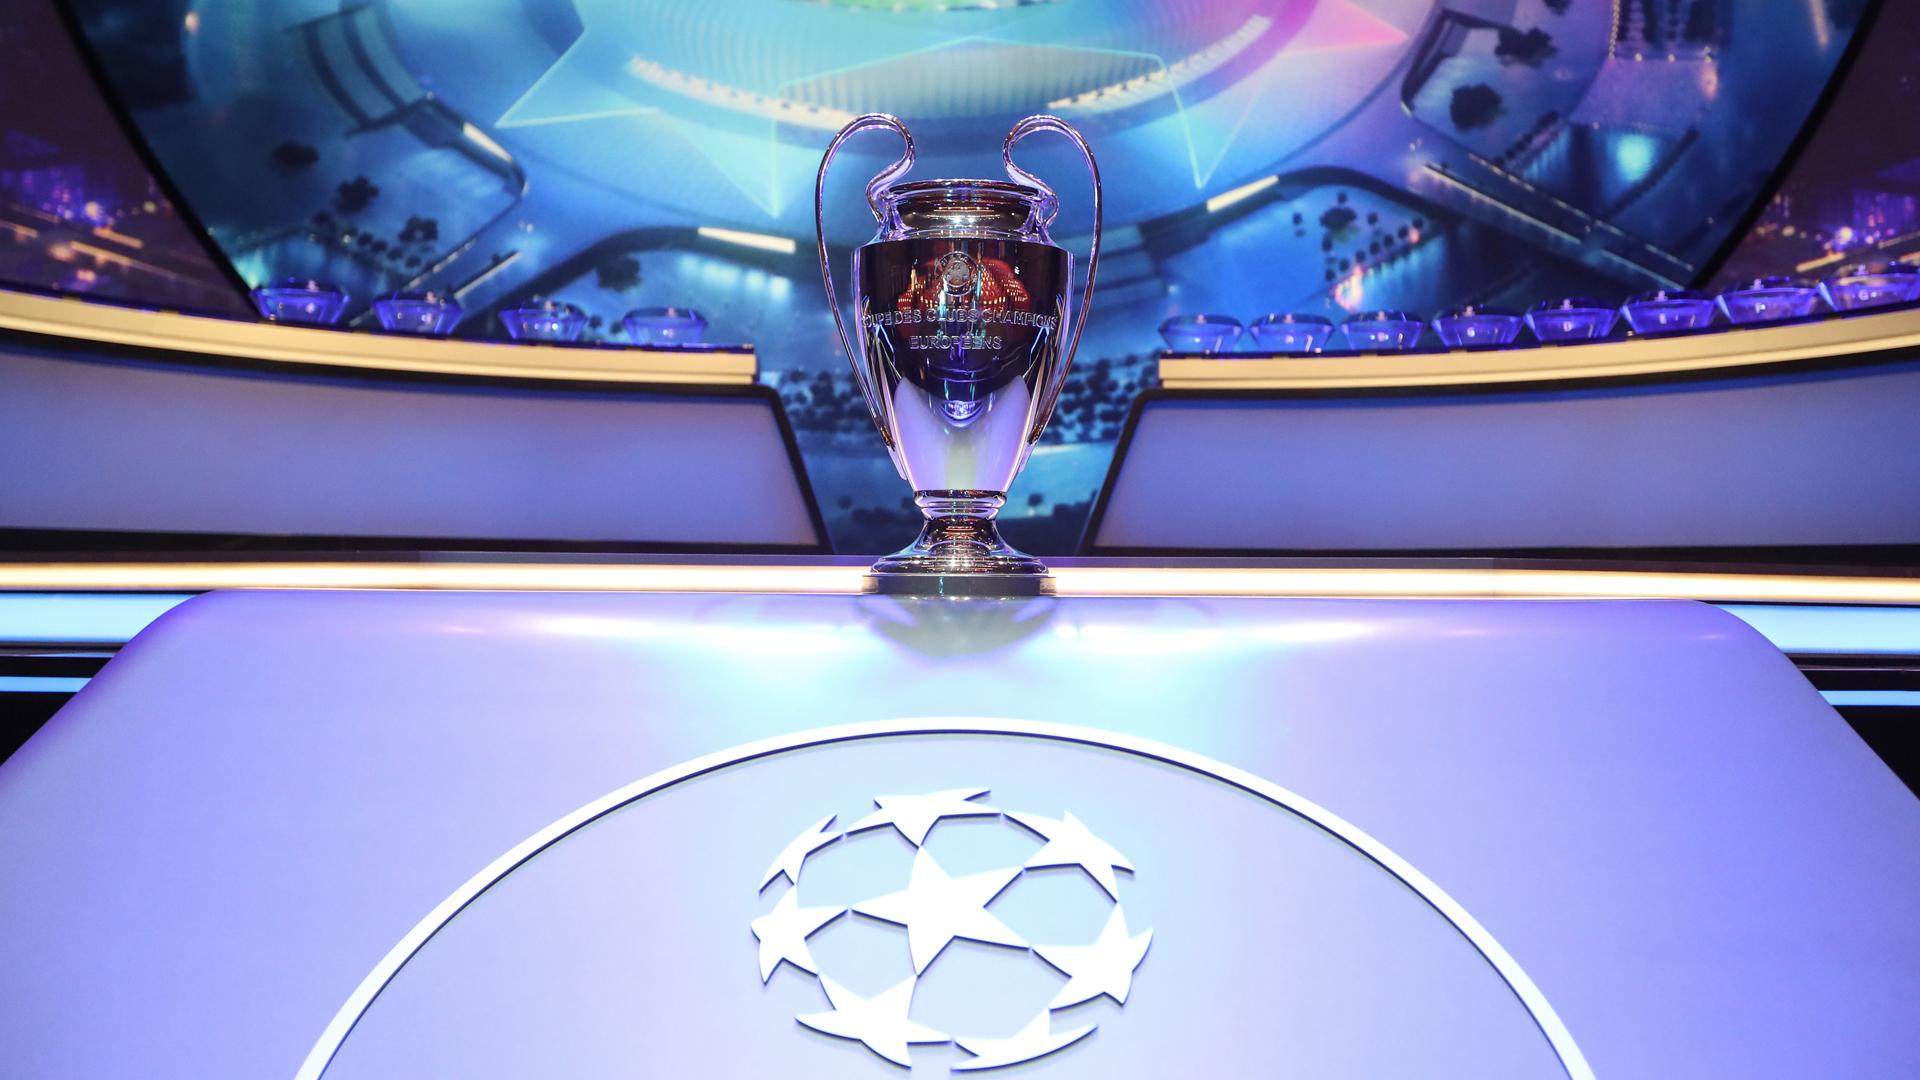 UEFA Champions League draw 2019/20